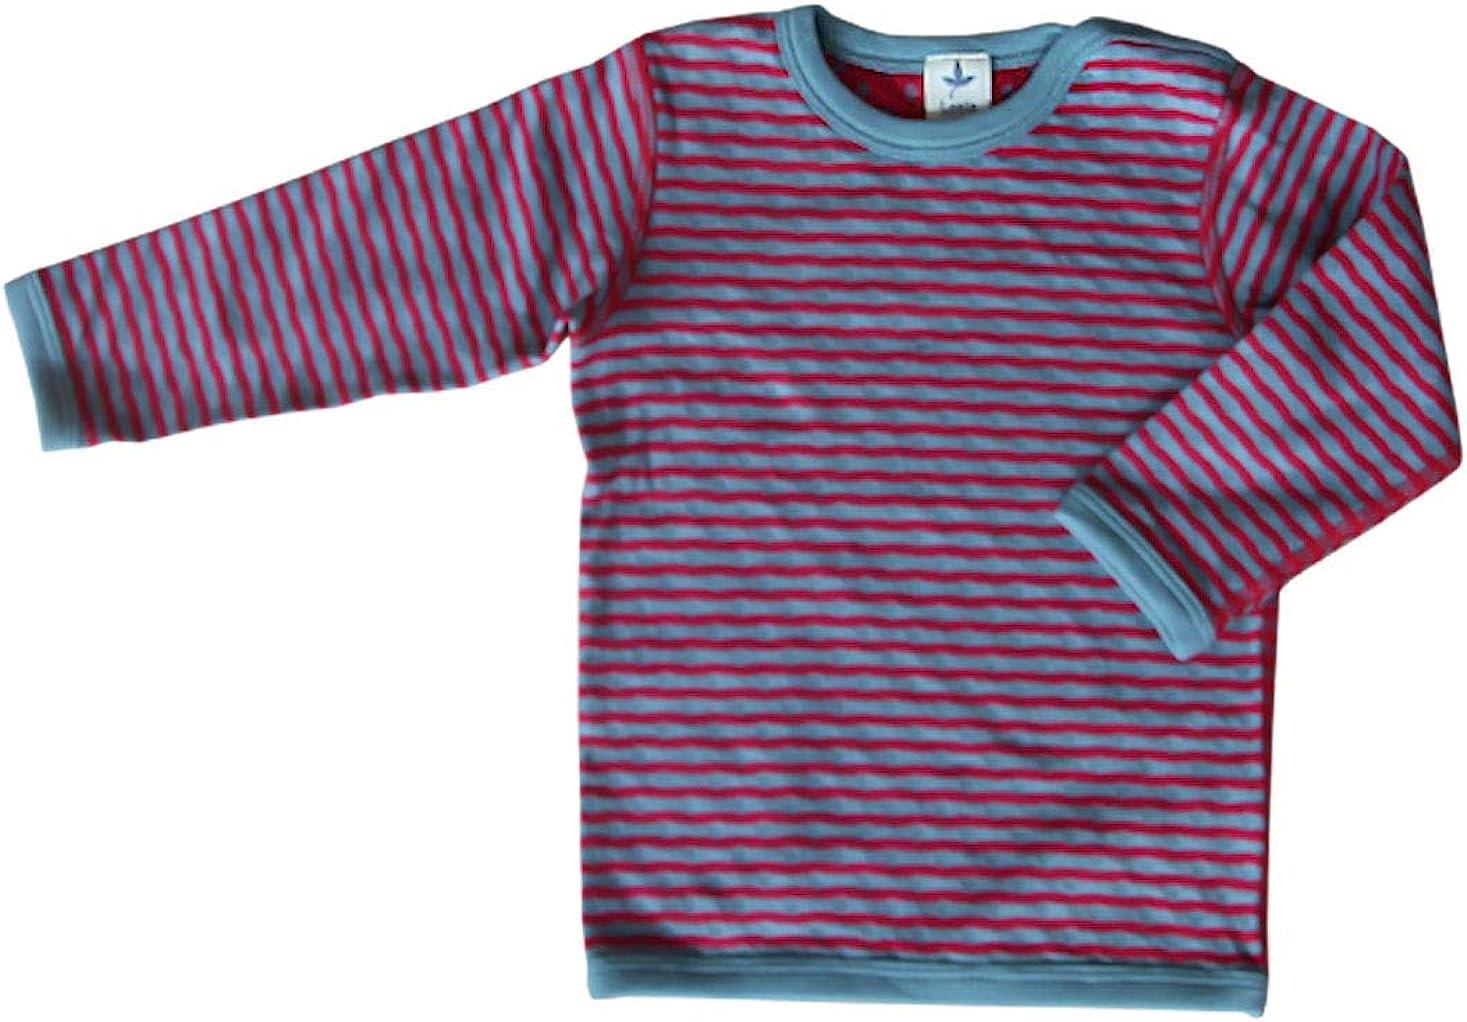 Leela Cotton - Camiseta Reversible de Manga Larga para niño (algodón ecológico): Amazon.es: Ropa y accesorios